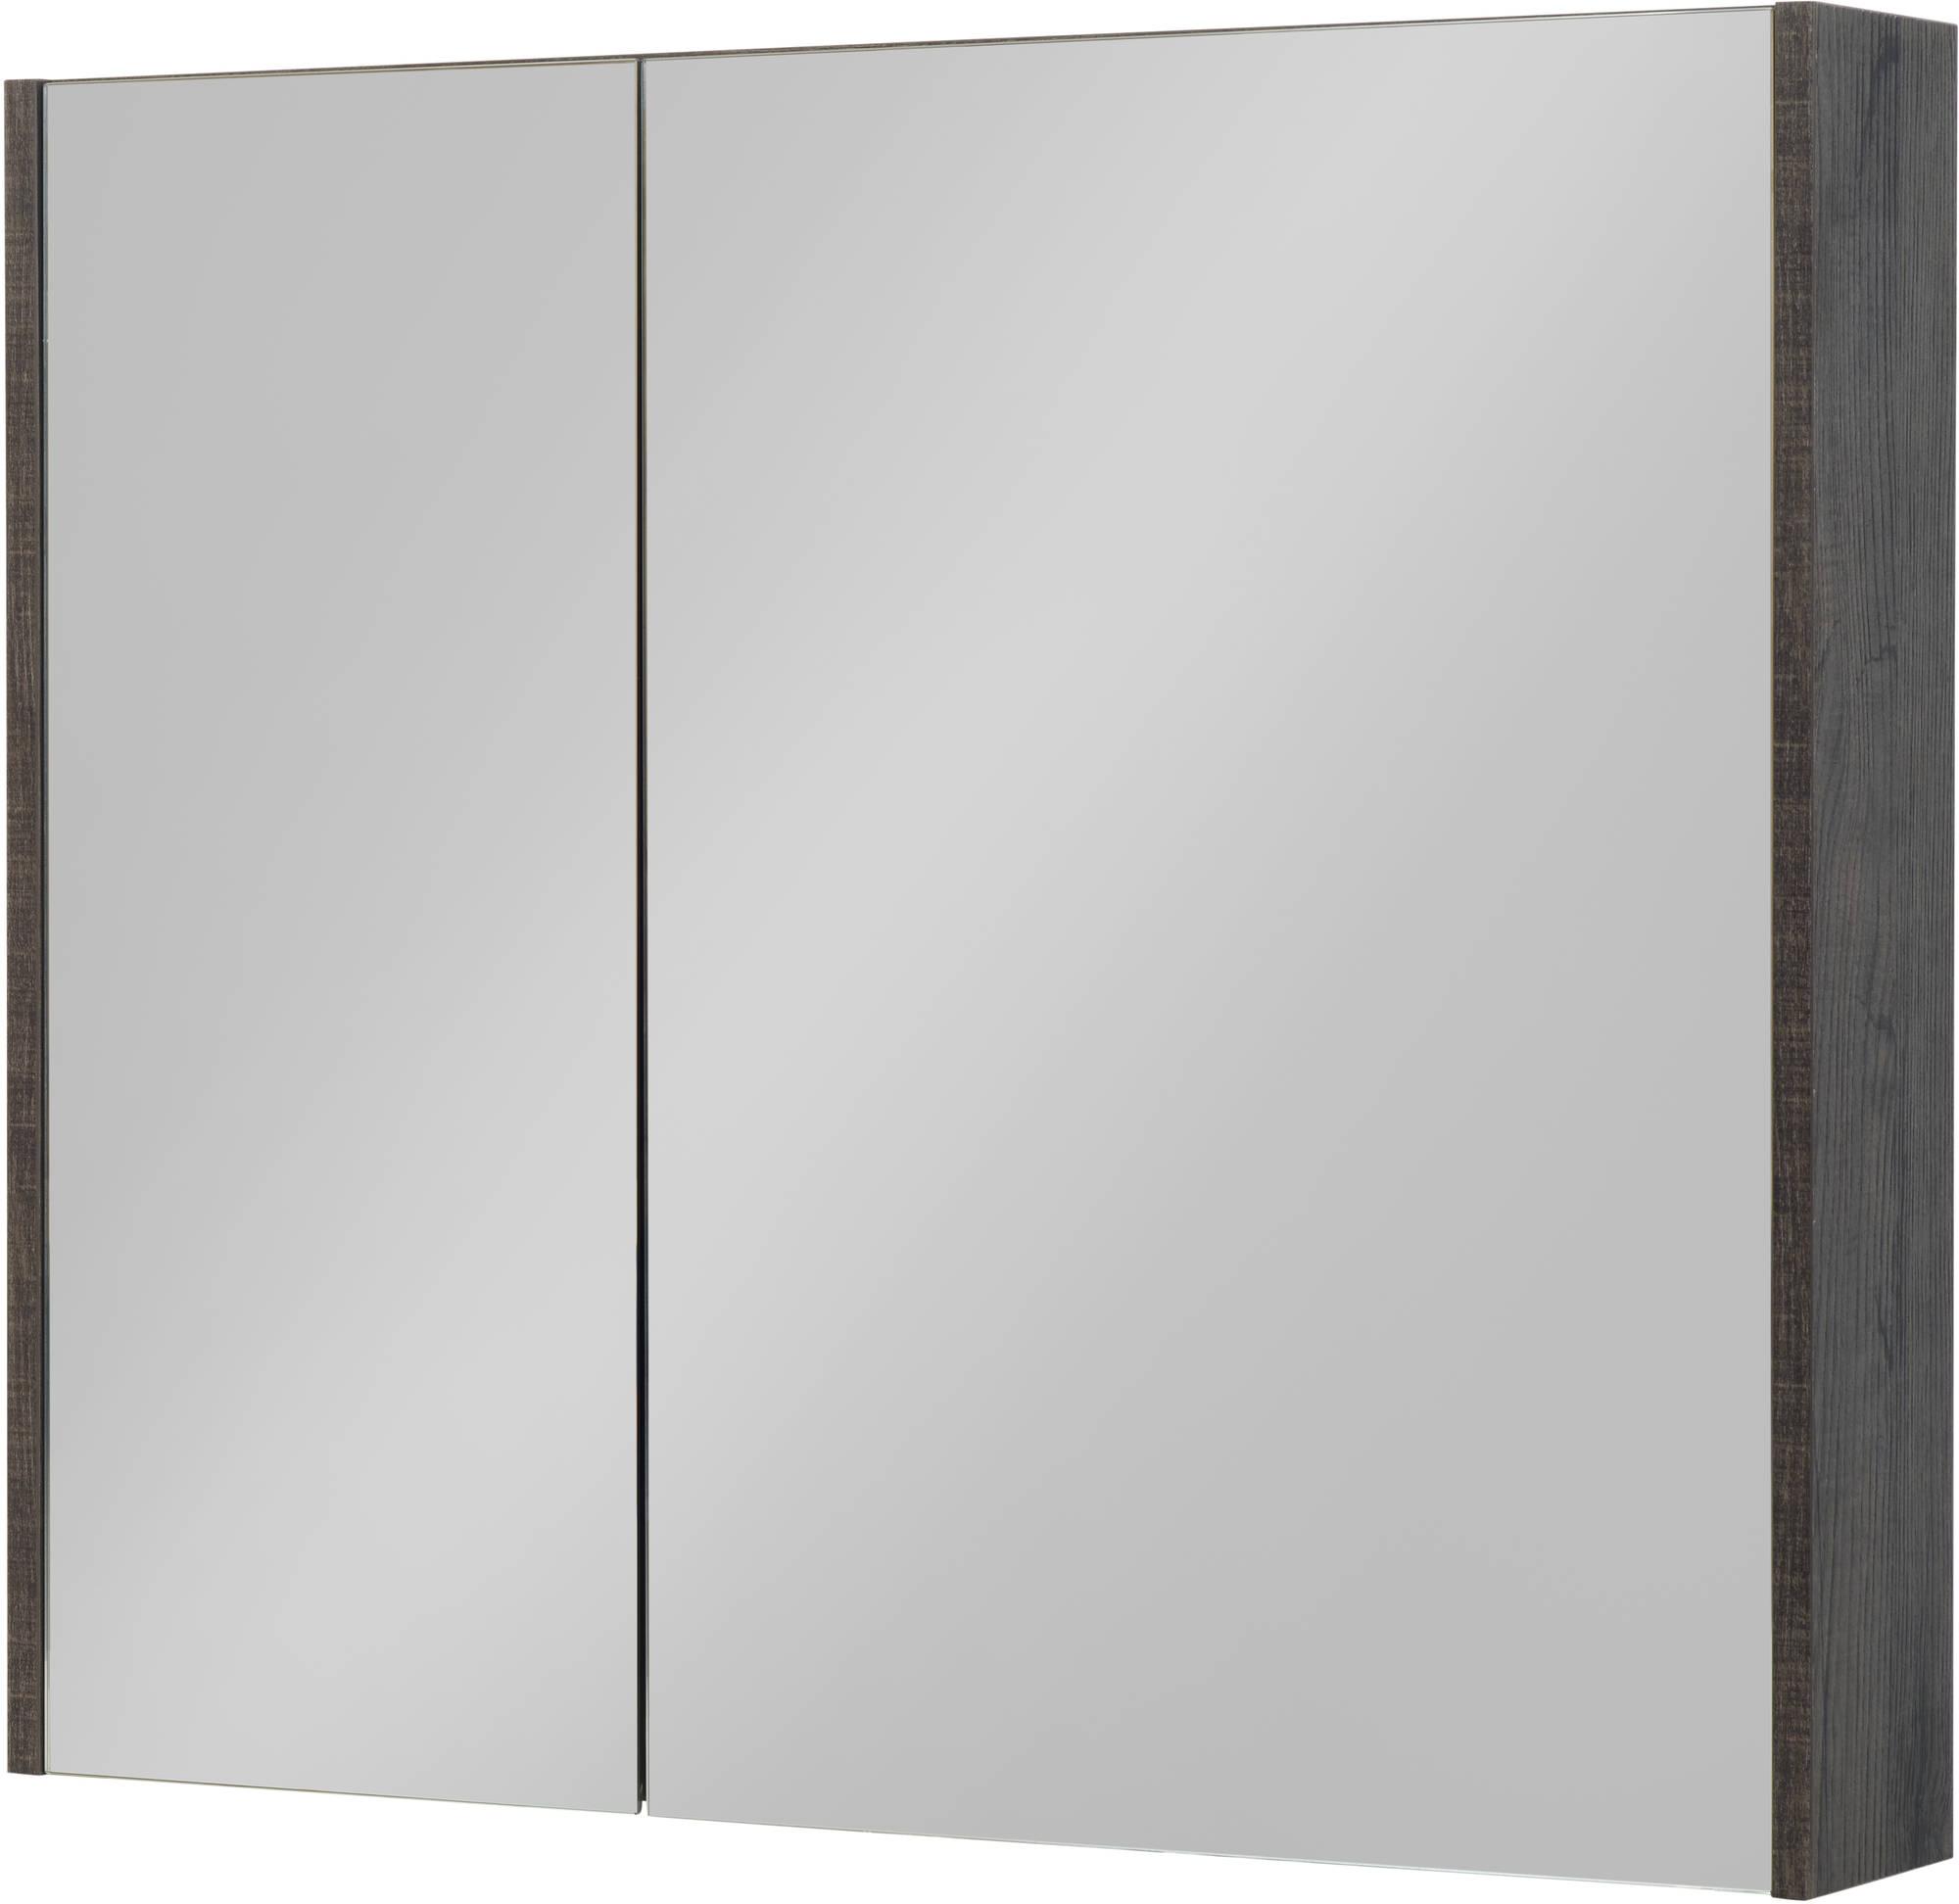 Saniselect Socan Spiegelkast 80x14x70 cm Kasteel Bruin